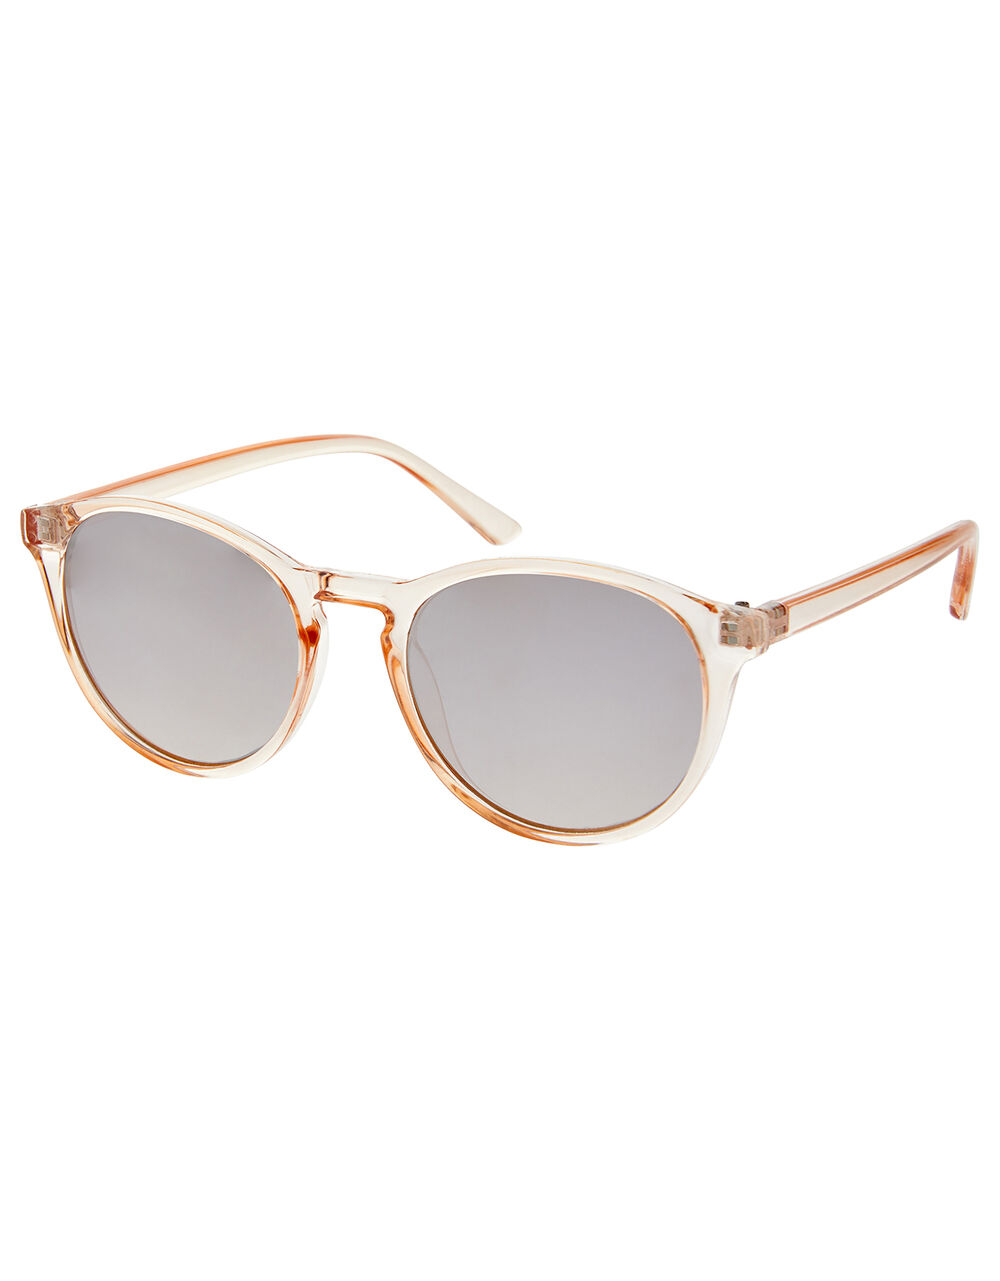 Pria Preppy Clear Frame Sunglasses, , large